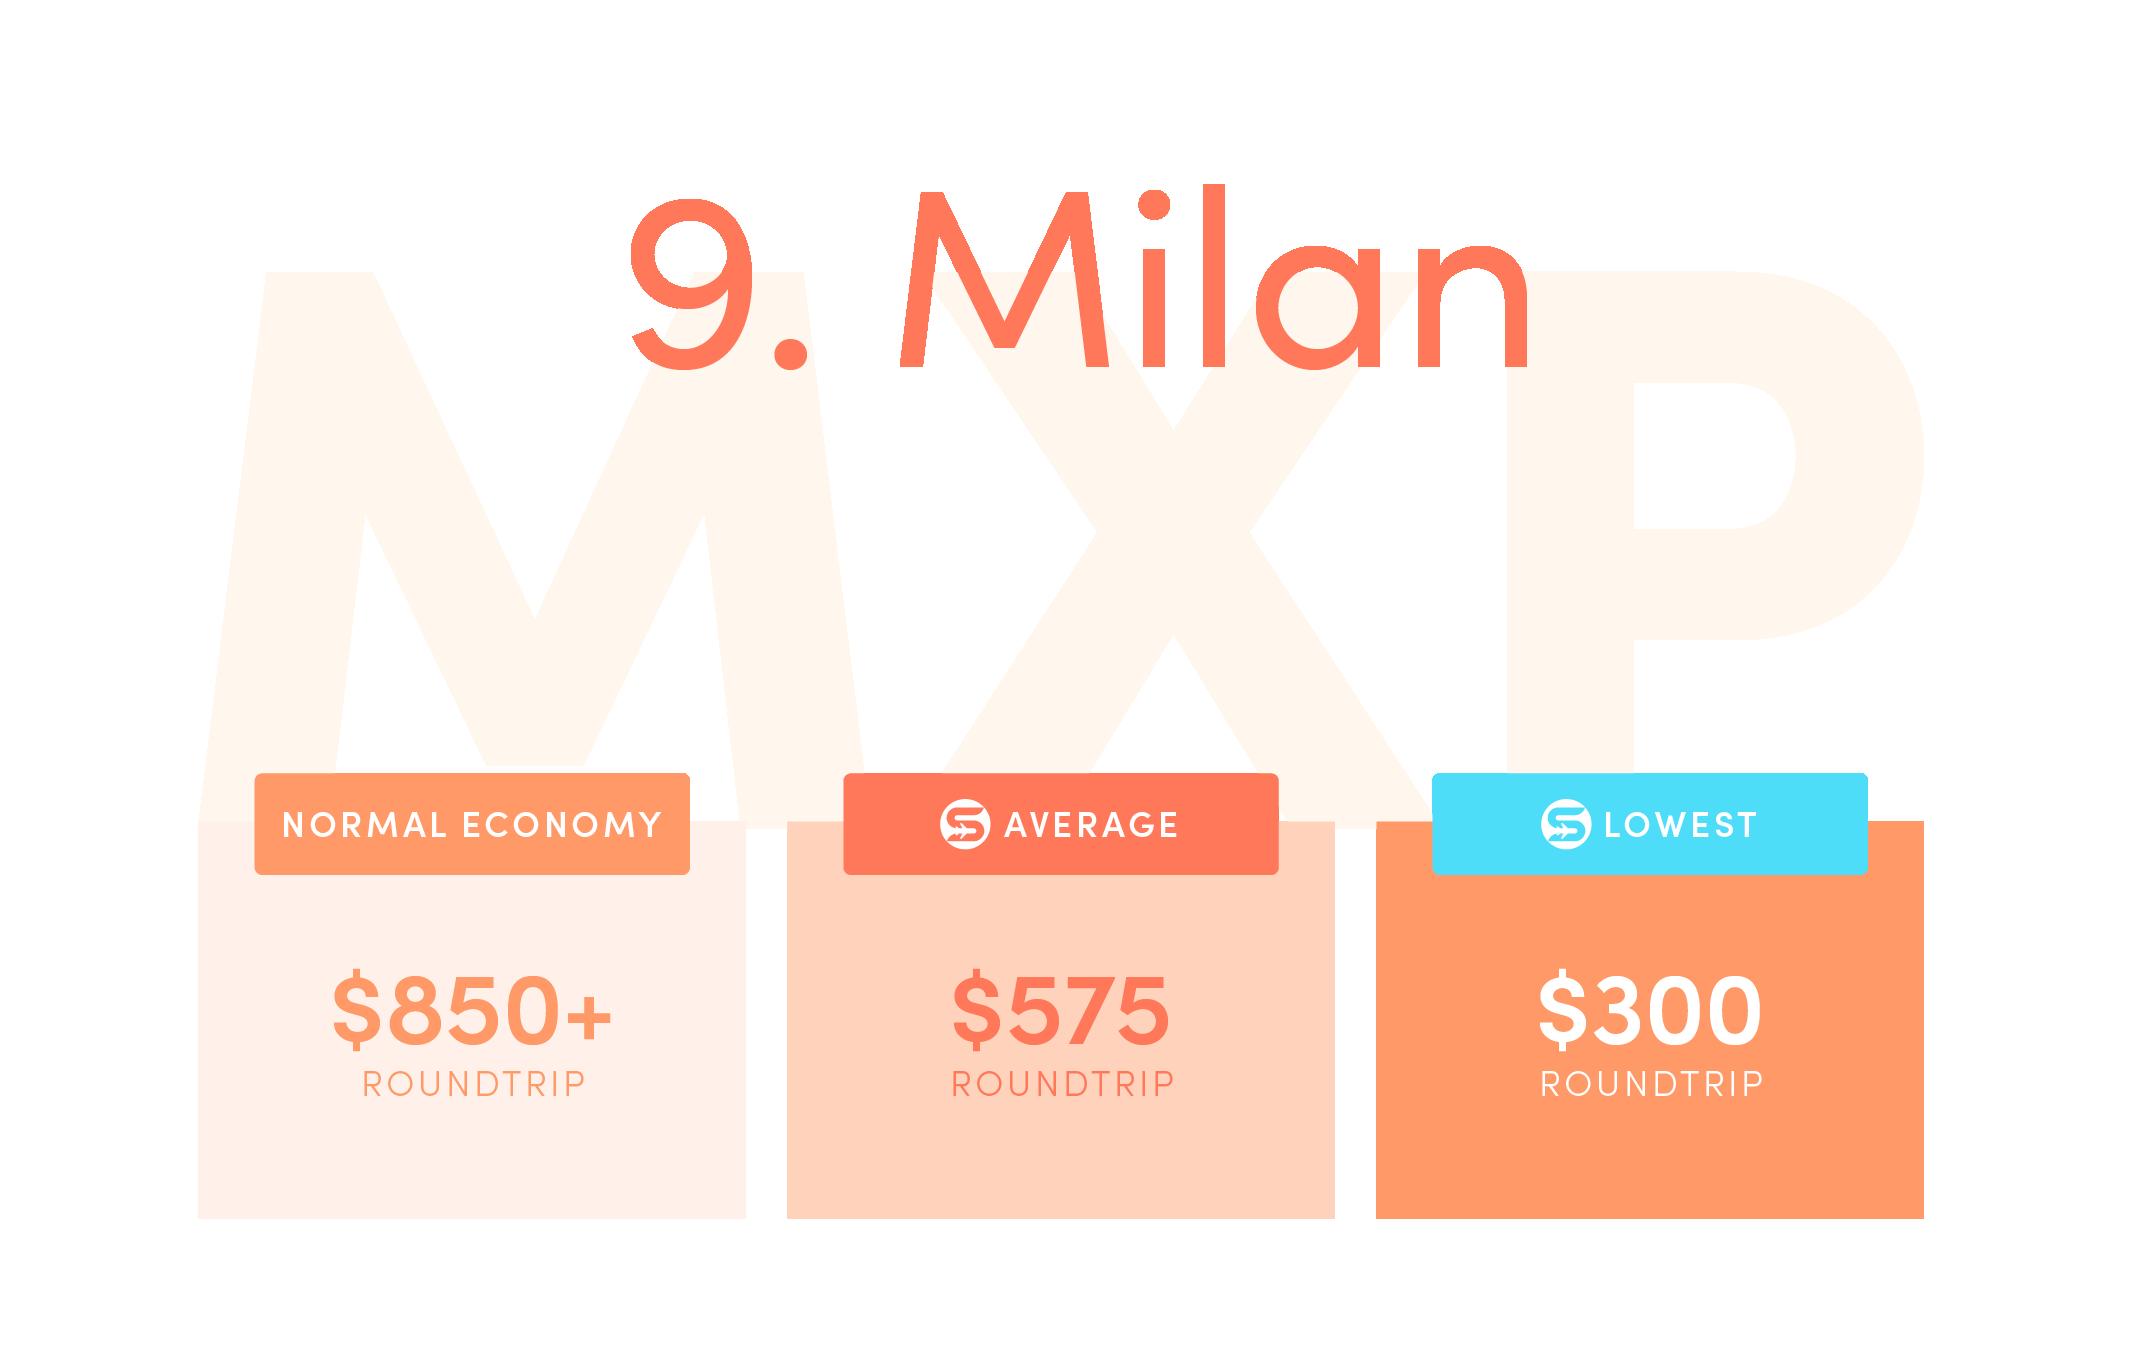 Milan (MXP). Normal economy price from the US: $850+ roundtrip. Average Scott's Cheap Flights economy price: $575 roundtrip.